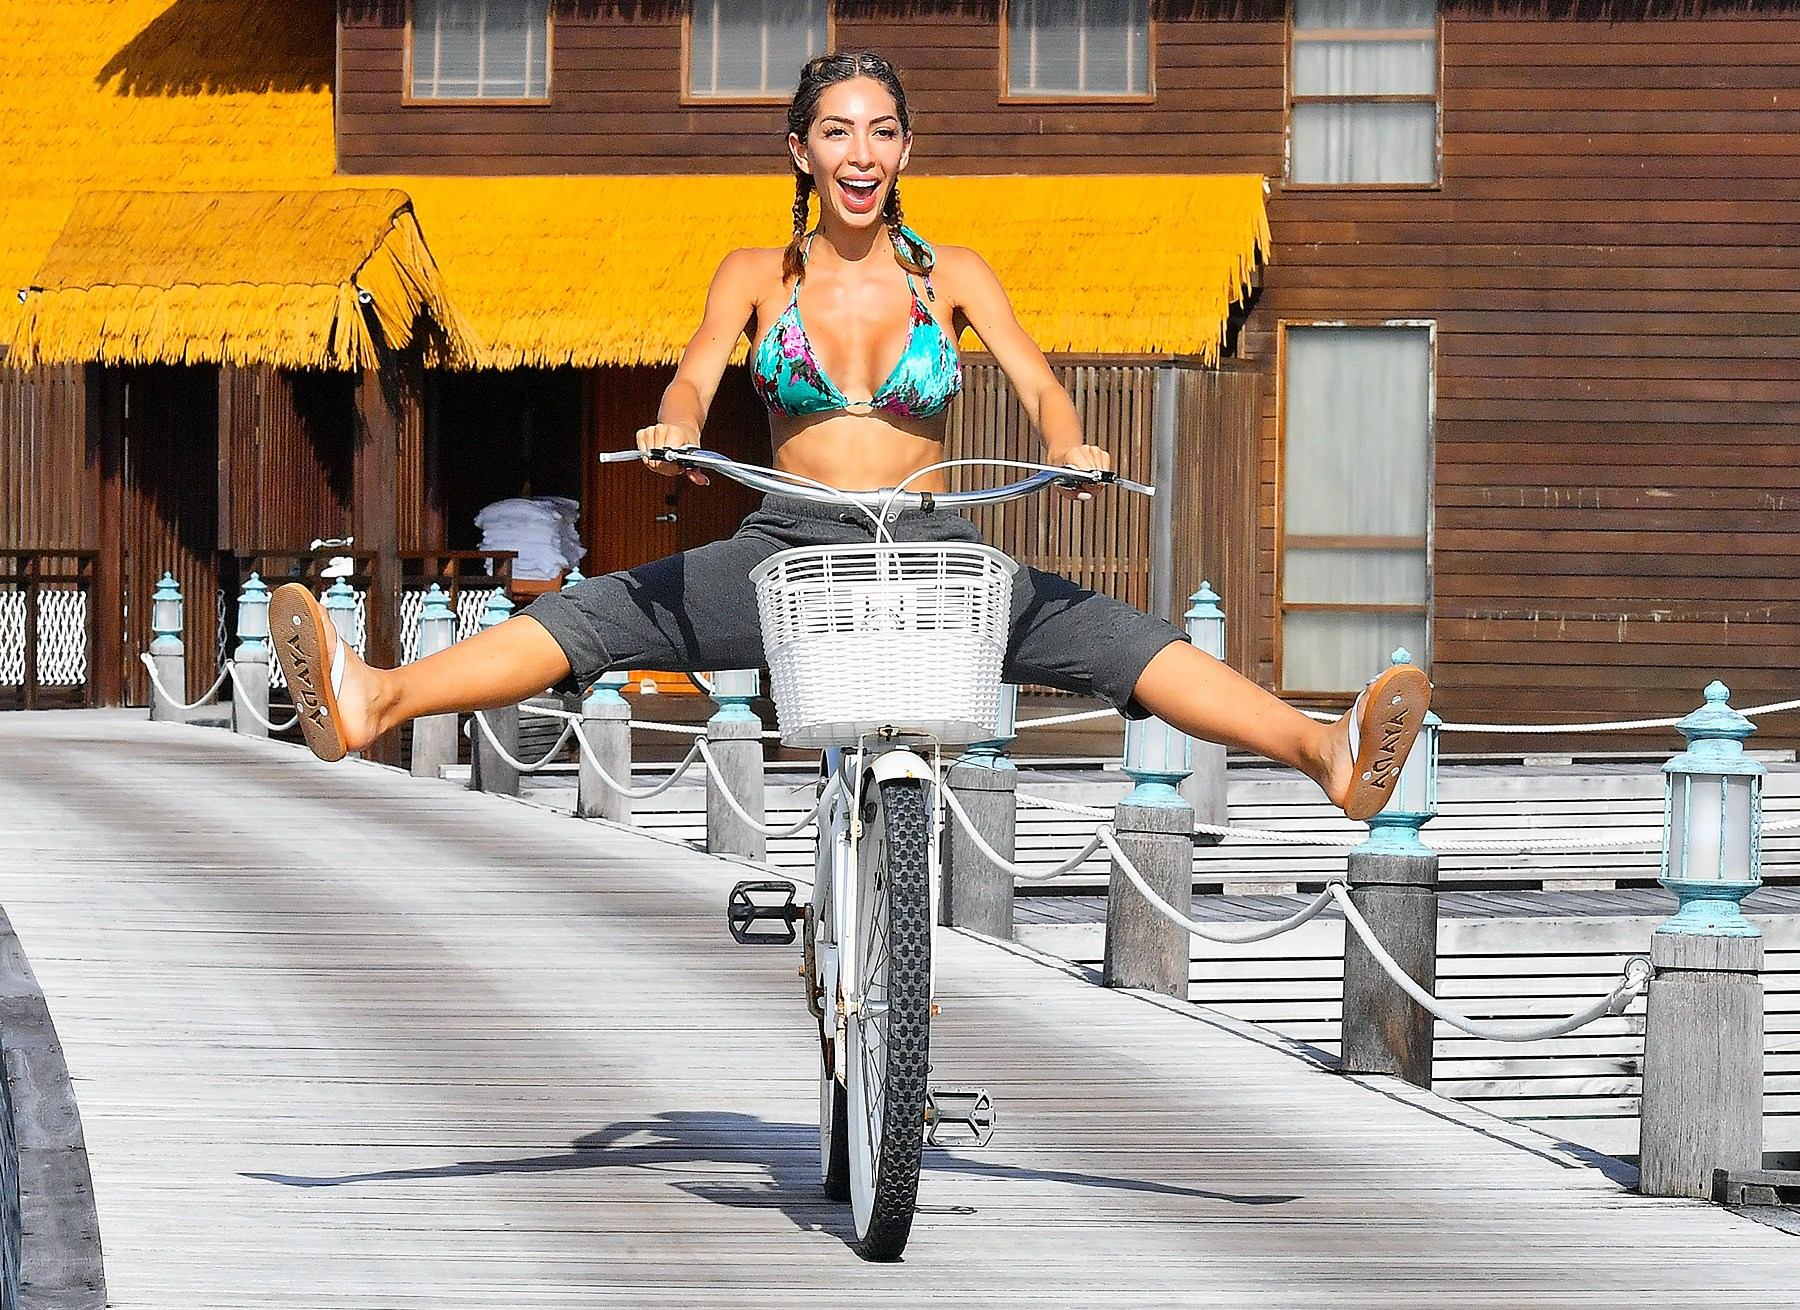 Farrah Abraham Bicycle Maldives